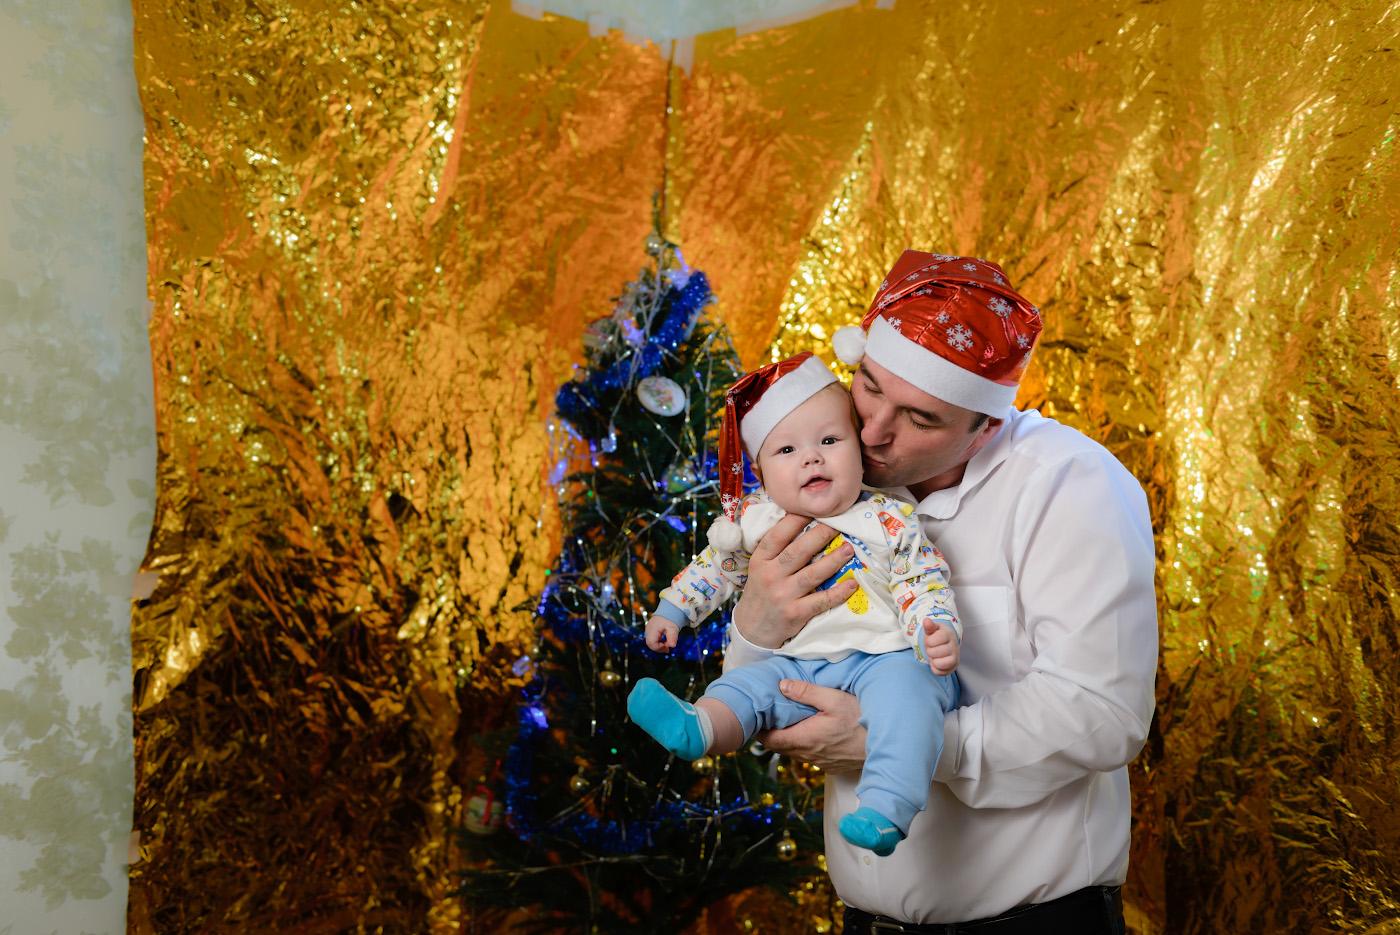 Фото 31. Новогодняя фотосессия с маленьким ребёнком. Снято на зеркалку Nikon D610 + Nikon 50mm f/1.8G. Освещение от одной внешней вспышки Yongnuo YN-685N. Настройки: 1/200, 3.2, 160, 38.